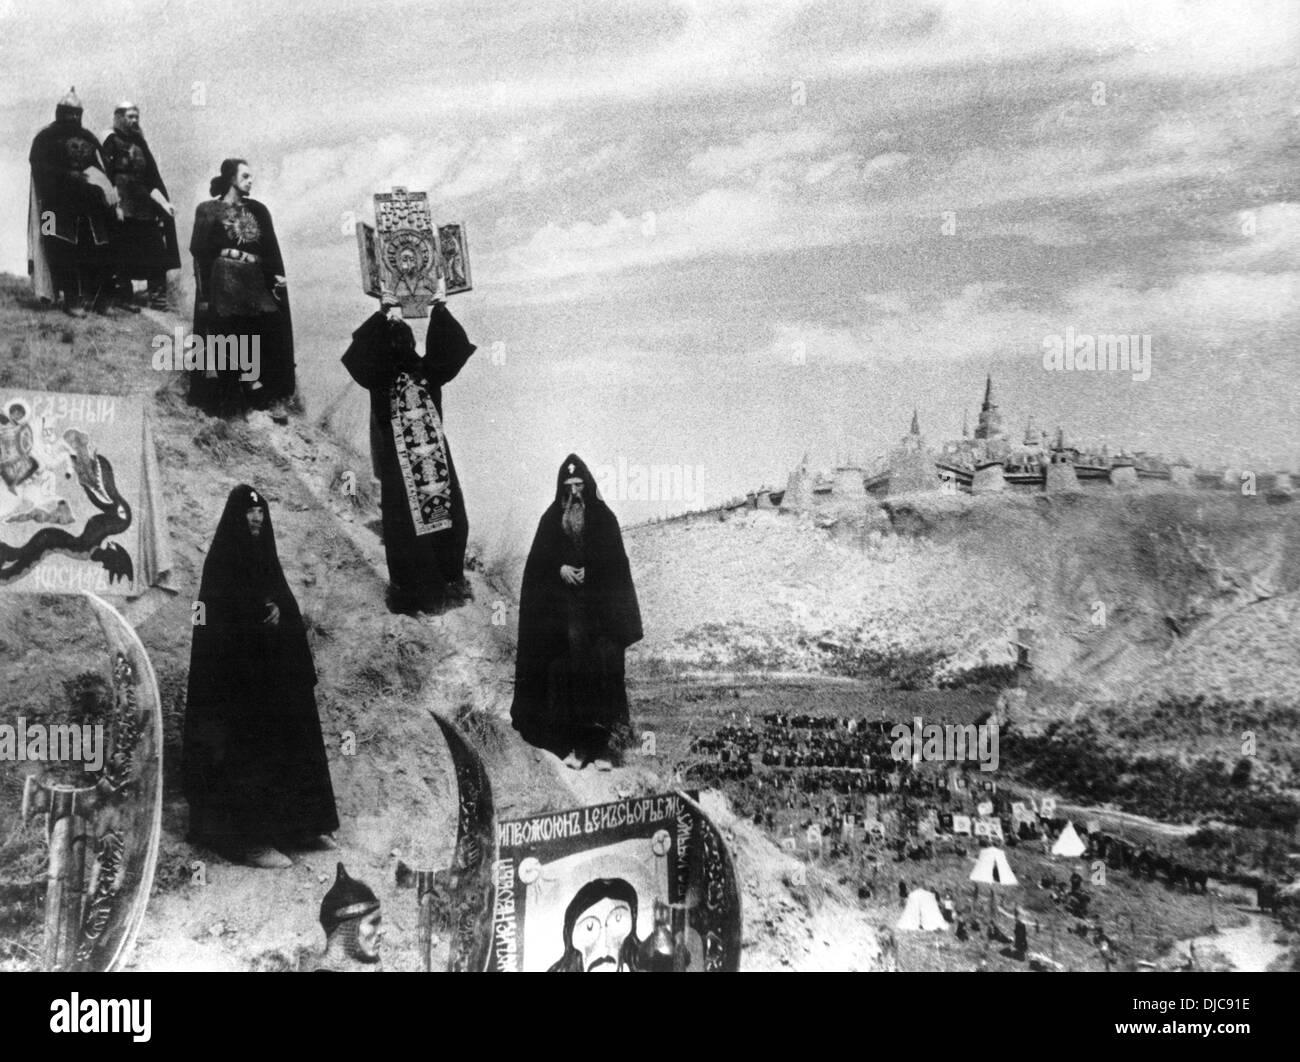 Nikolai Cherkassov on-set of the Film, Ivan the Terrible (aka Ivan Groznyy I), 1944 - Stock Image